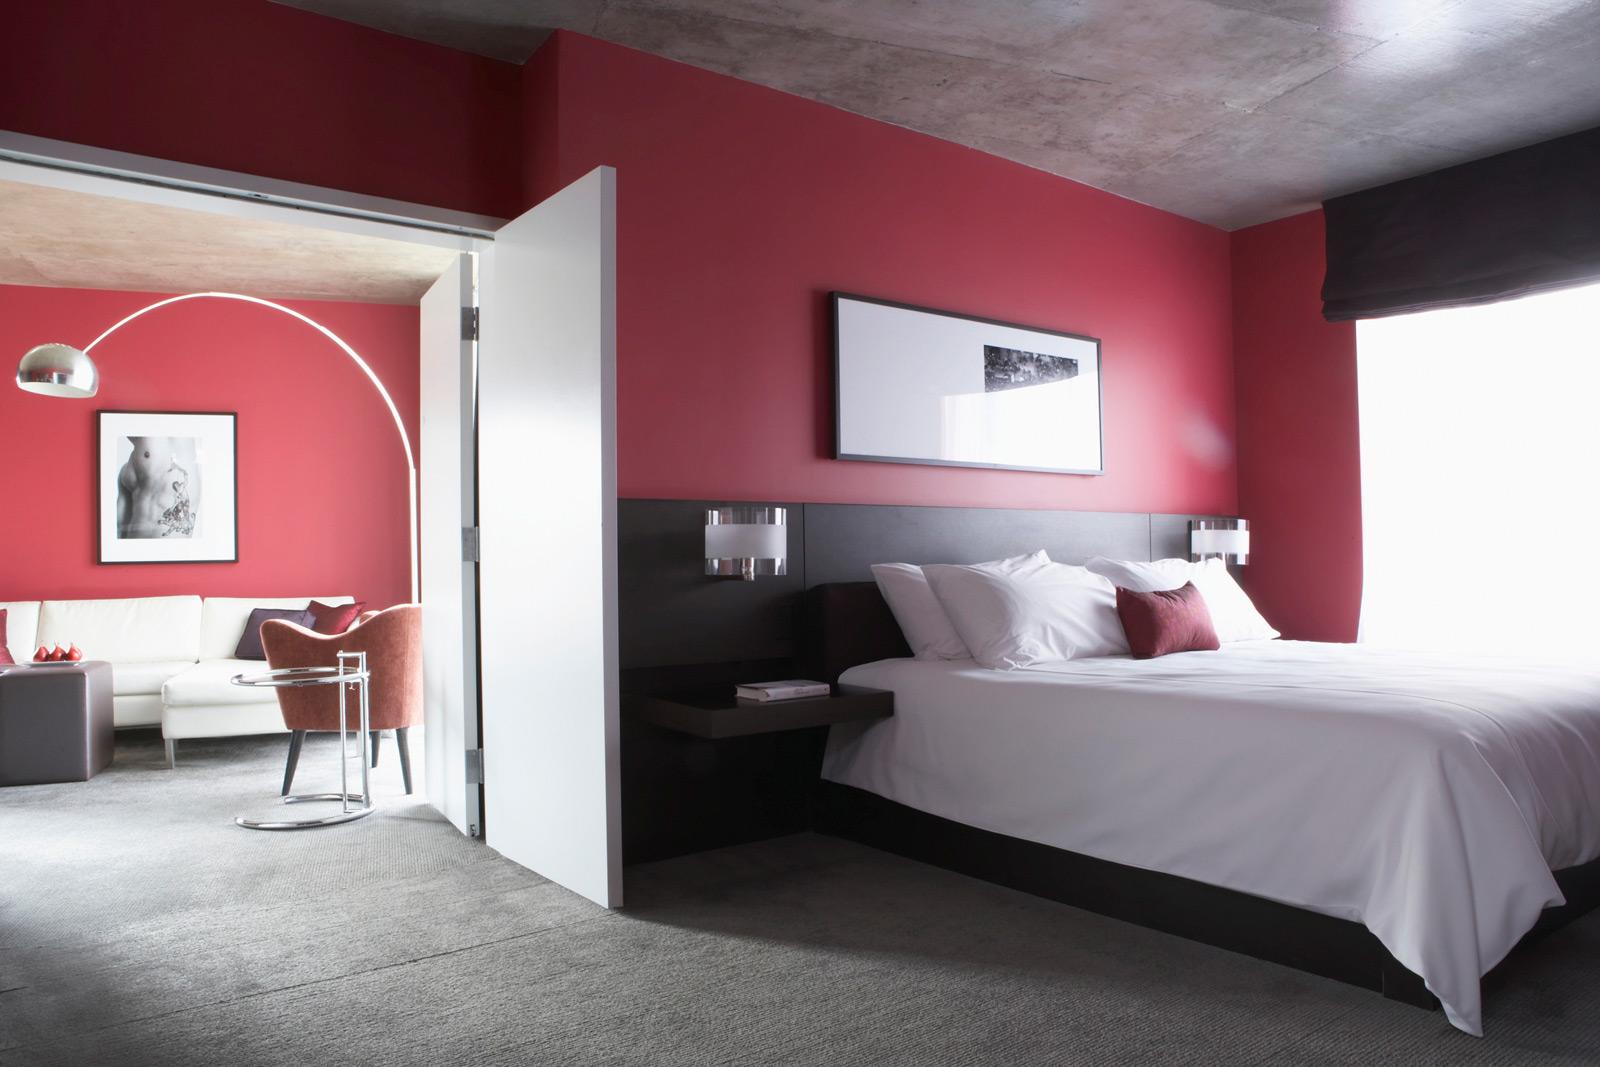 Bedroom color paint Photo - 1